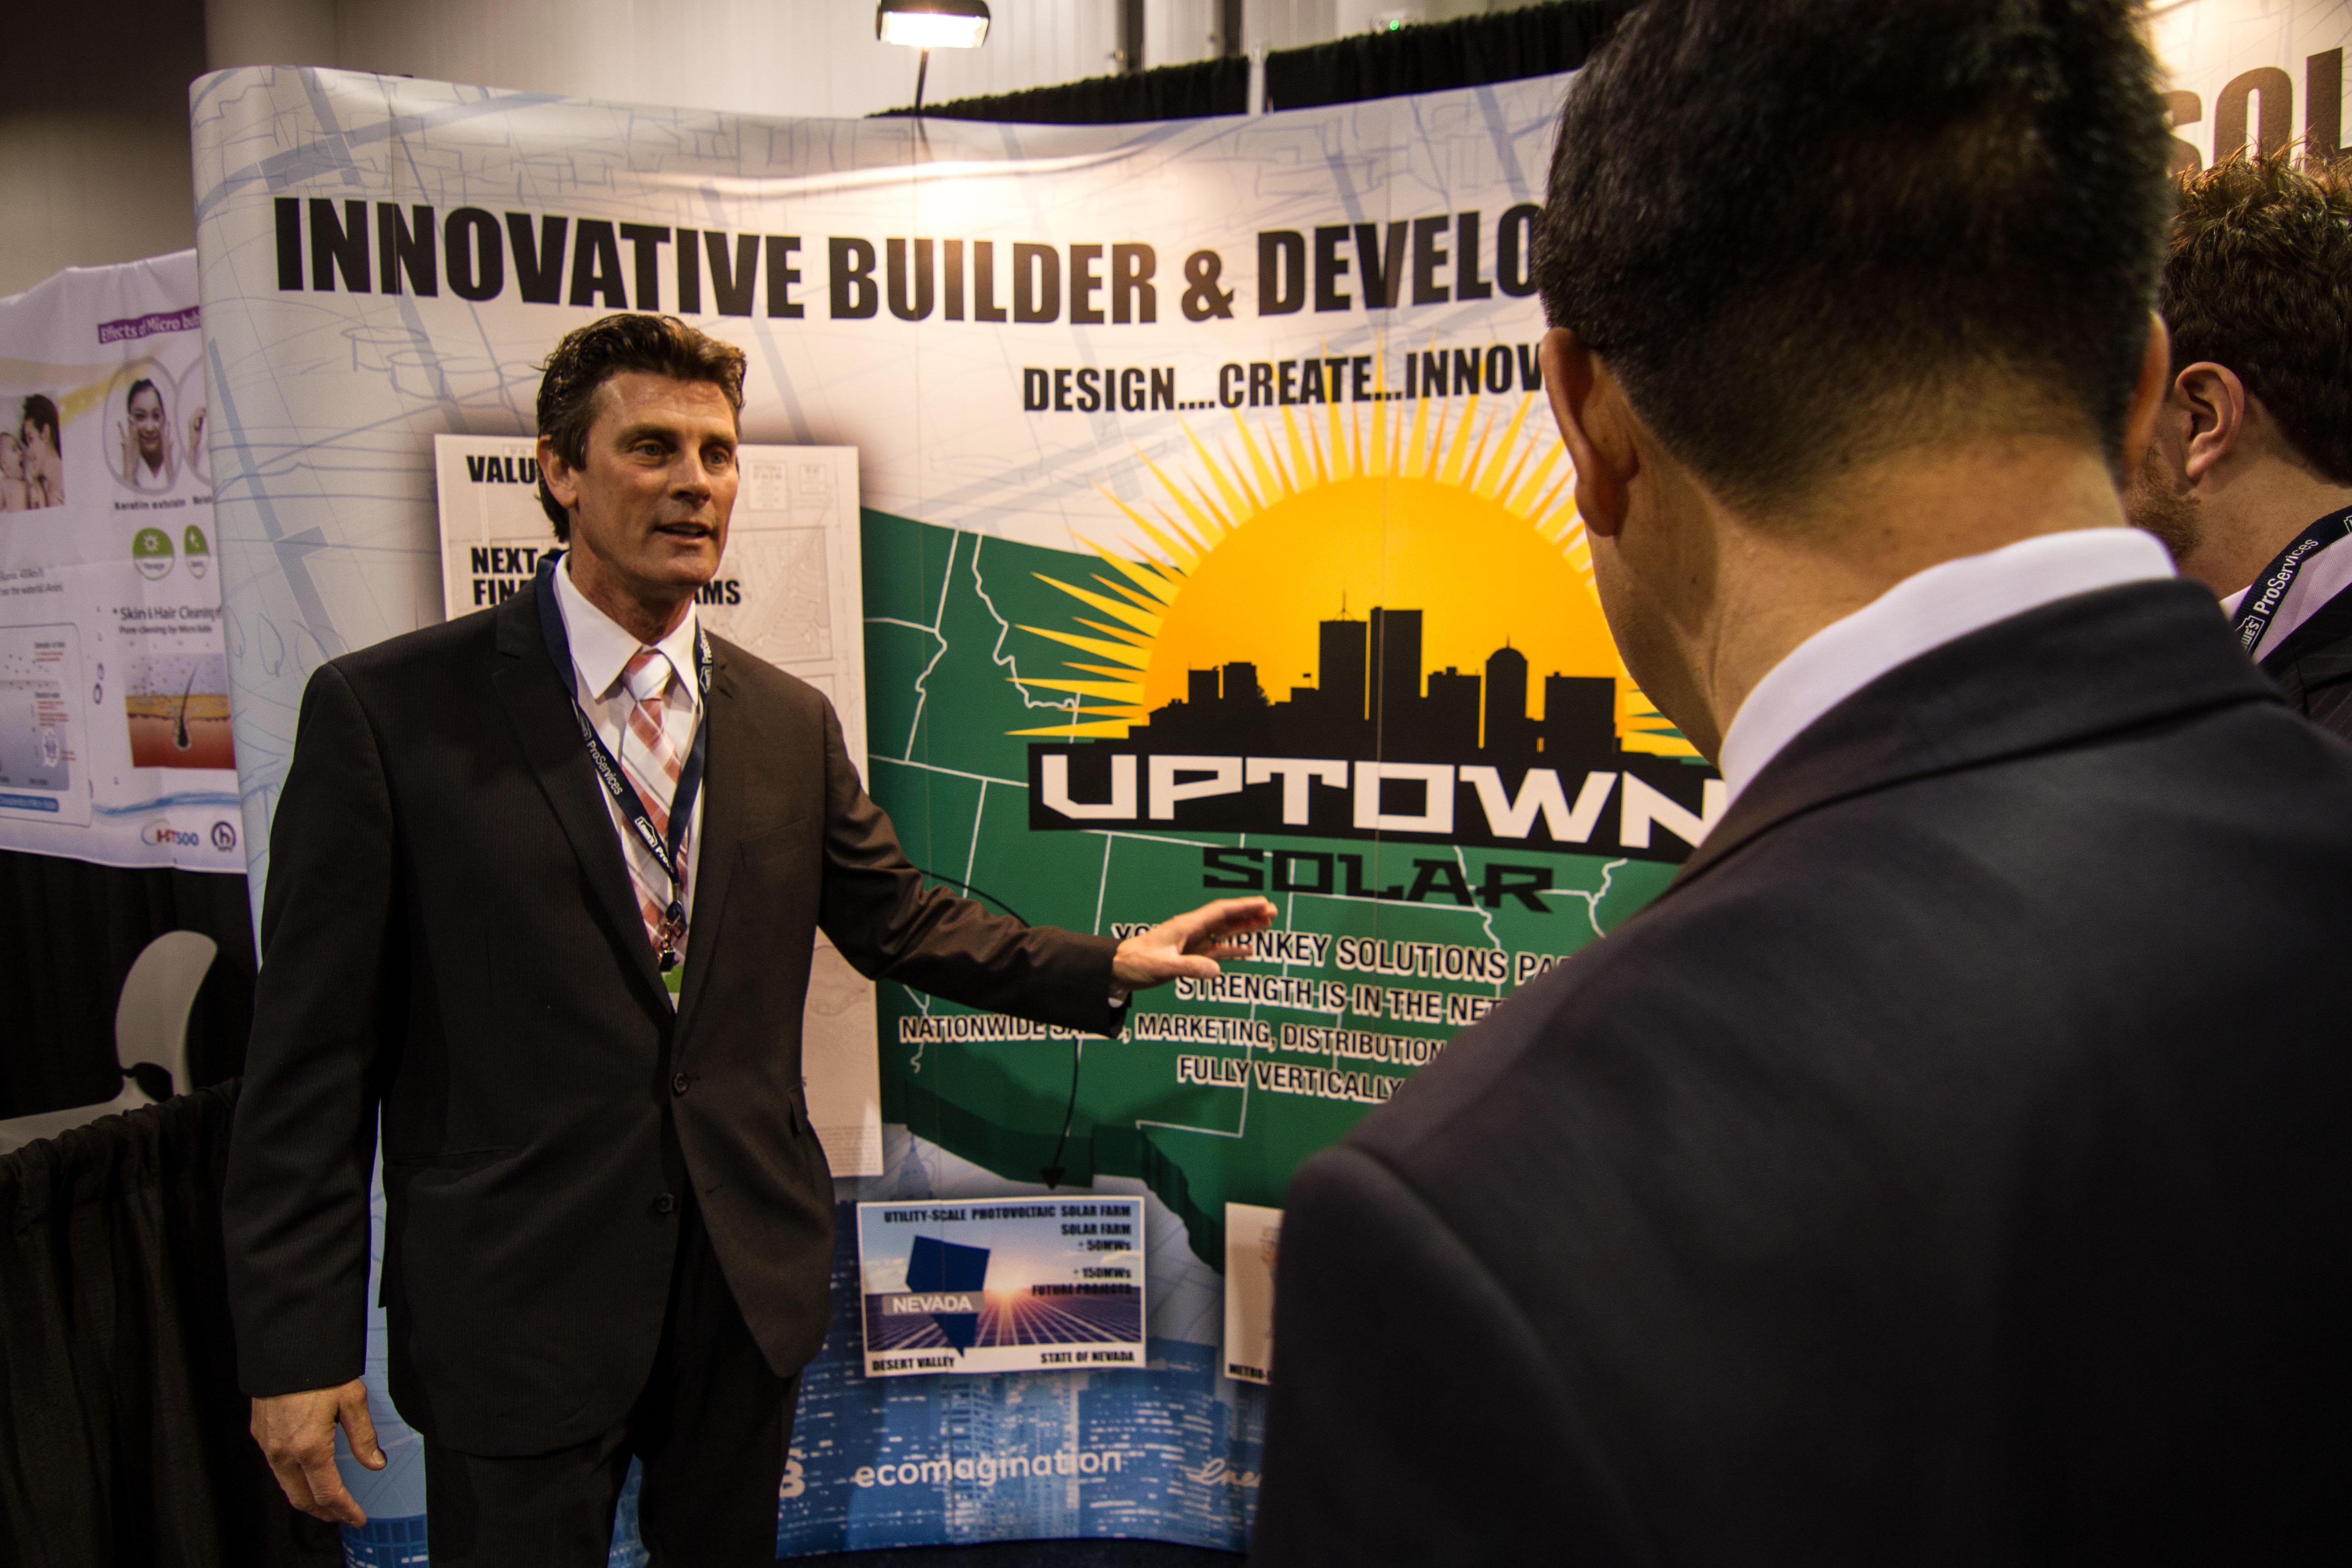 Up Town Solar TP-9.jpg